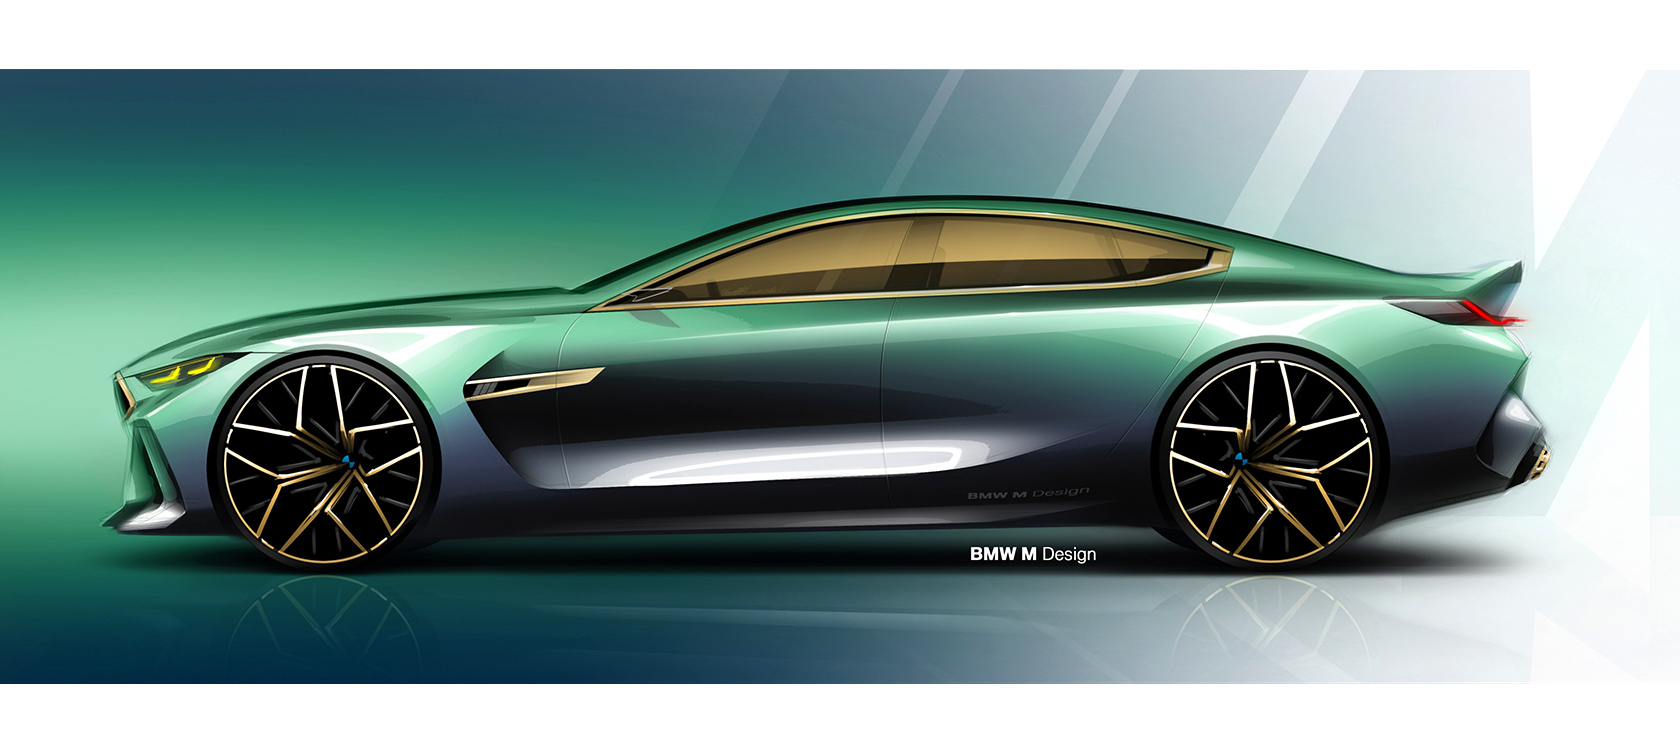 BMW Concept M8 Gran Coupé ׀ Luxury Sports Cars ׀ BMW Canada